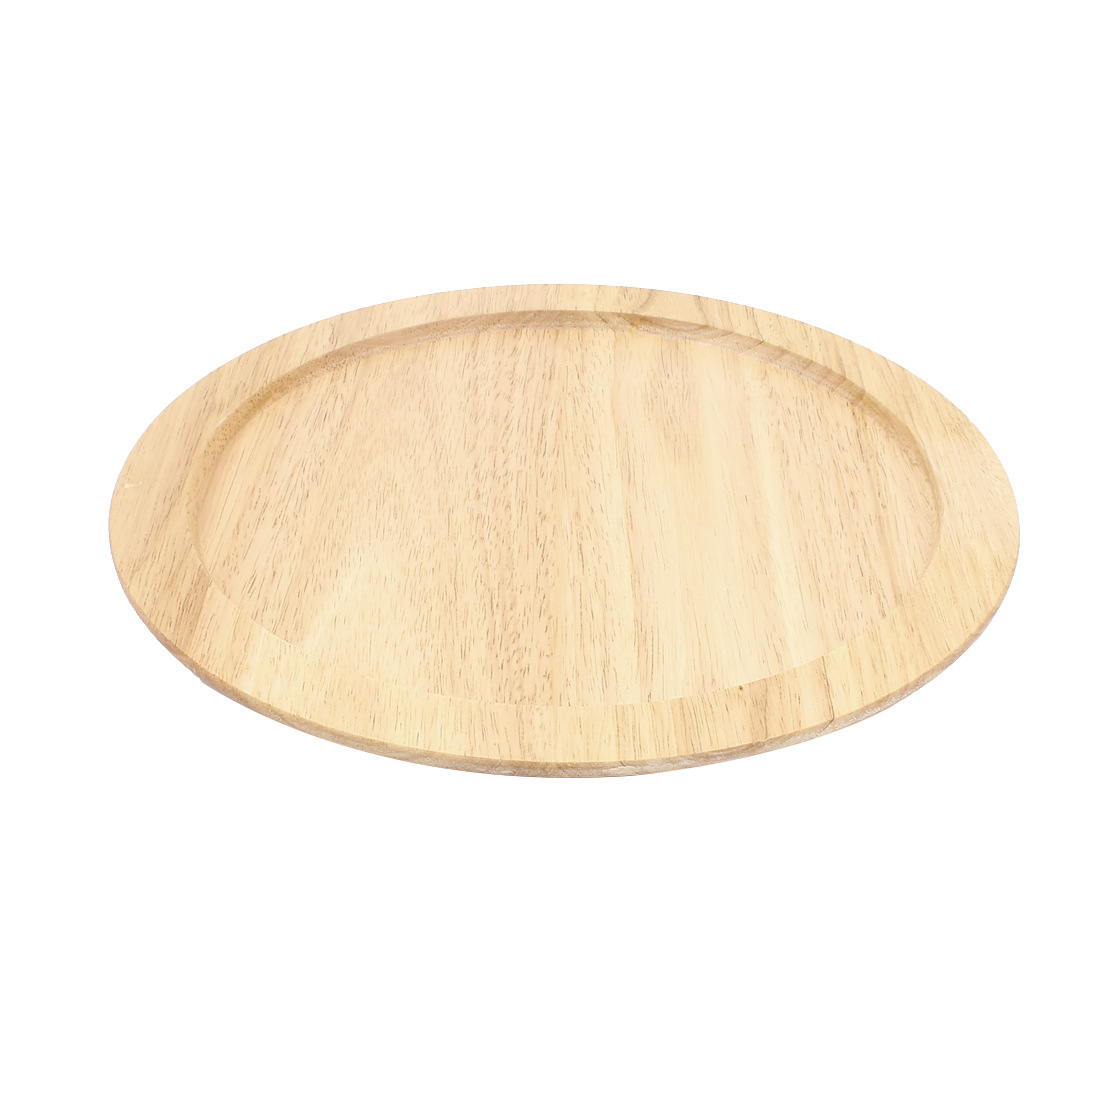 Restaurant Kitchen Wood Round Shaped Tea Serving Tray Platter 30 x 2cm